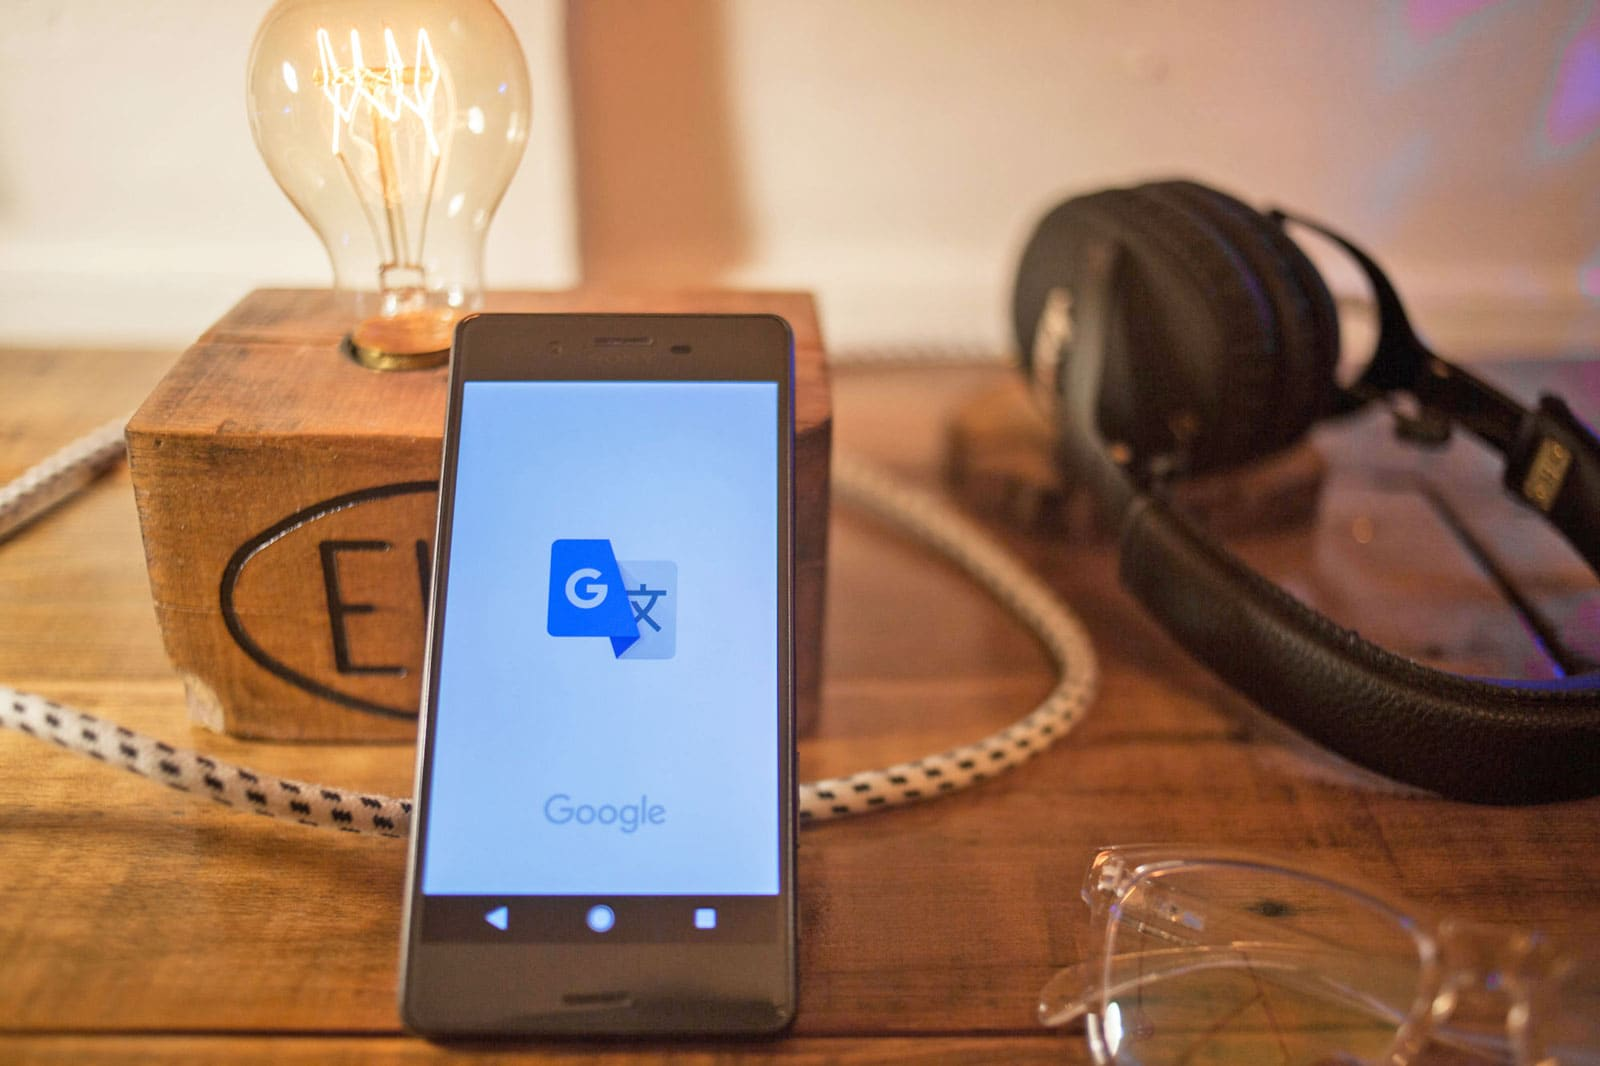 English To Italian Translator Google: Google Translate Adds Real-time Translations For 13 New